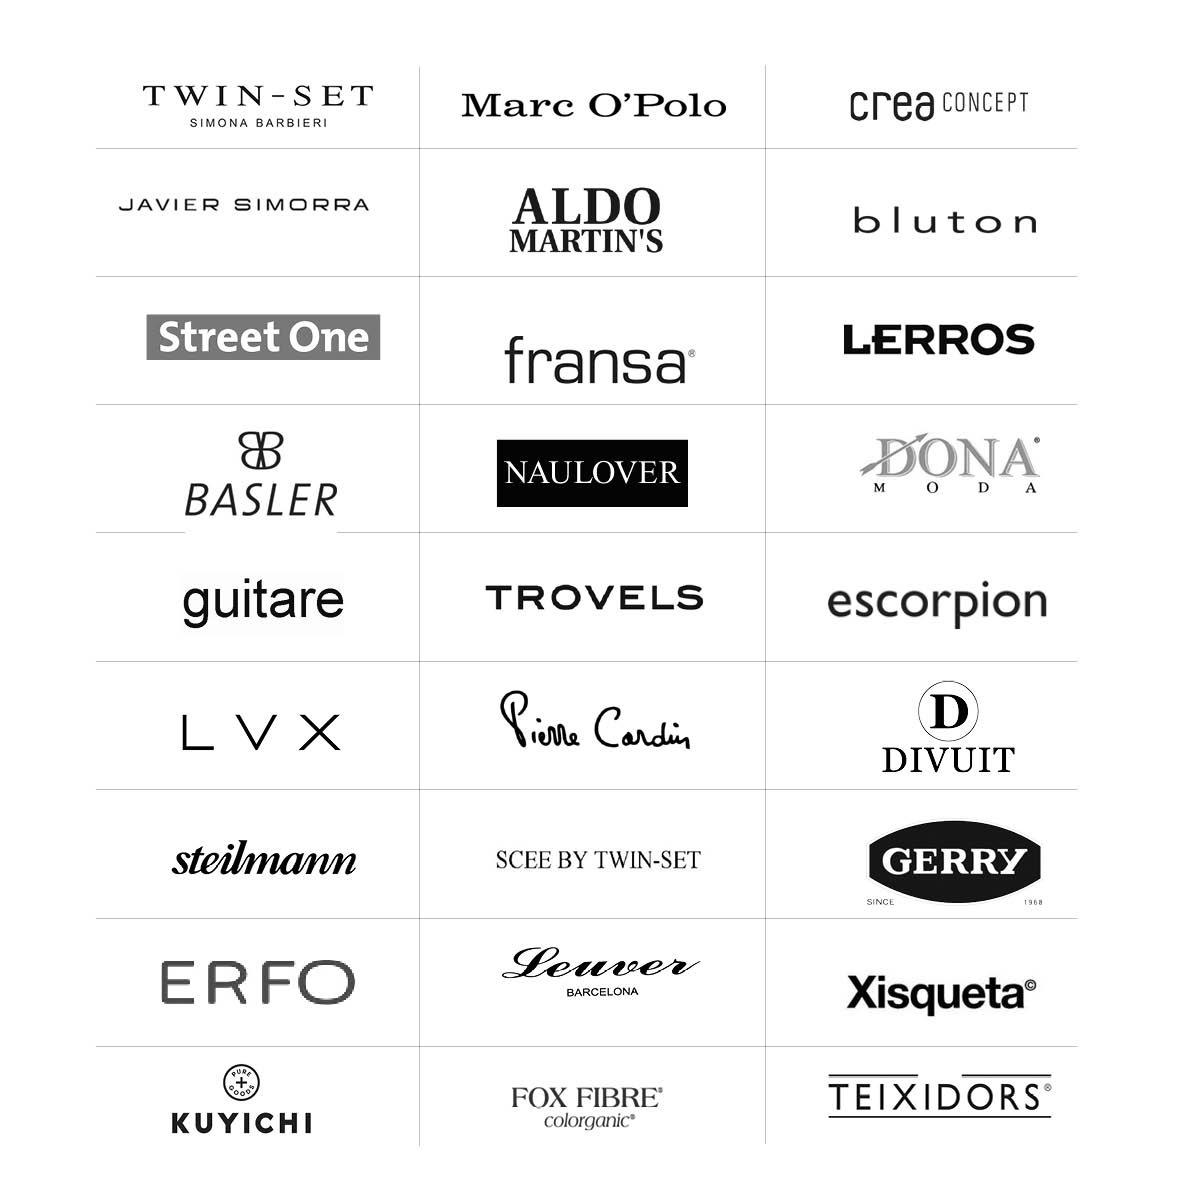 marcas-de-ropa-barbany-granollers-tienda-de-ropa-lacoste-boss2